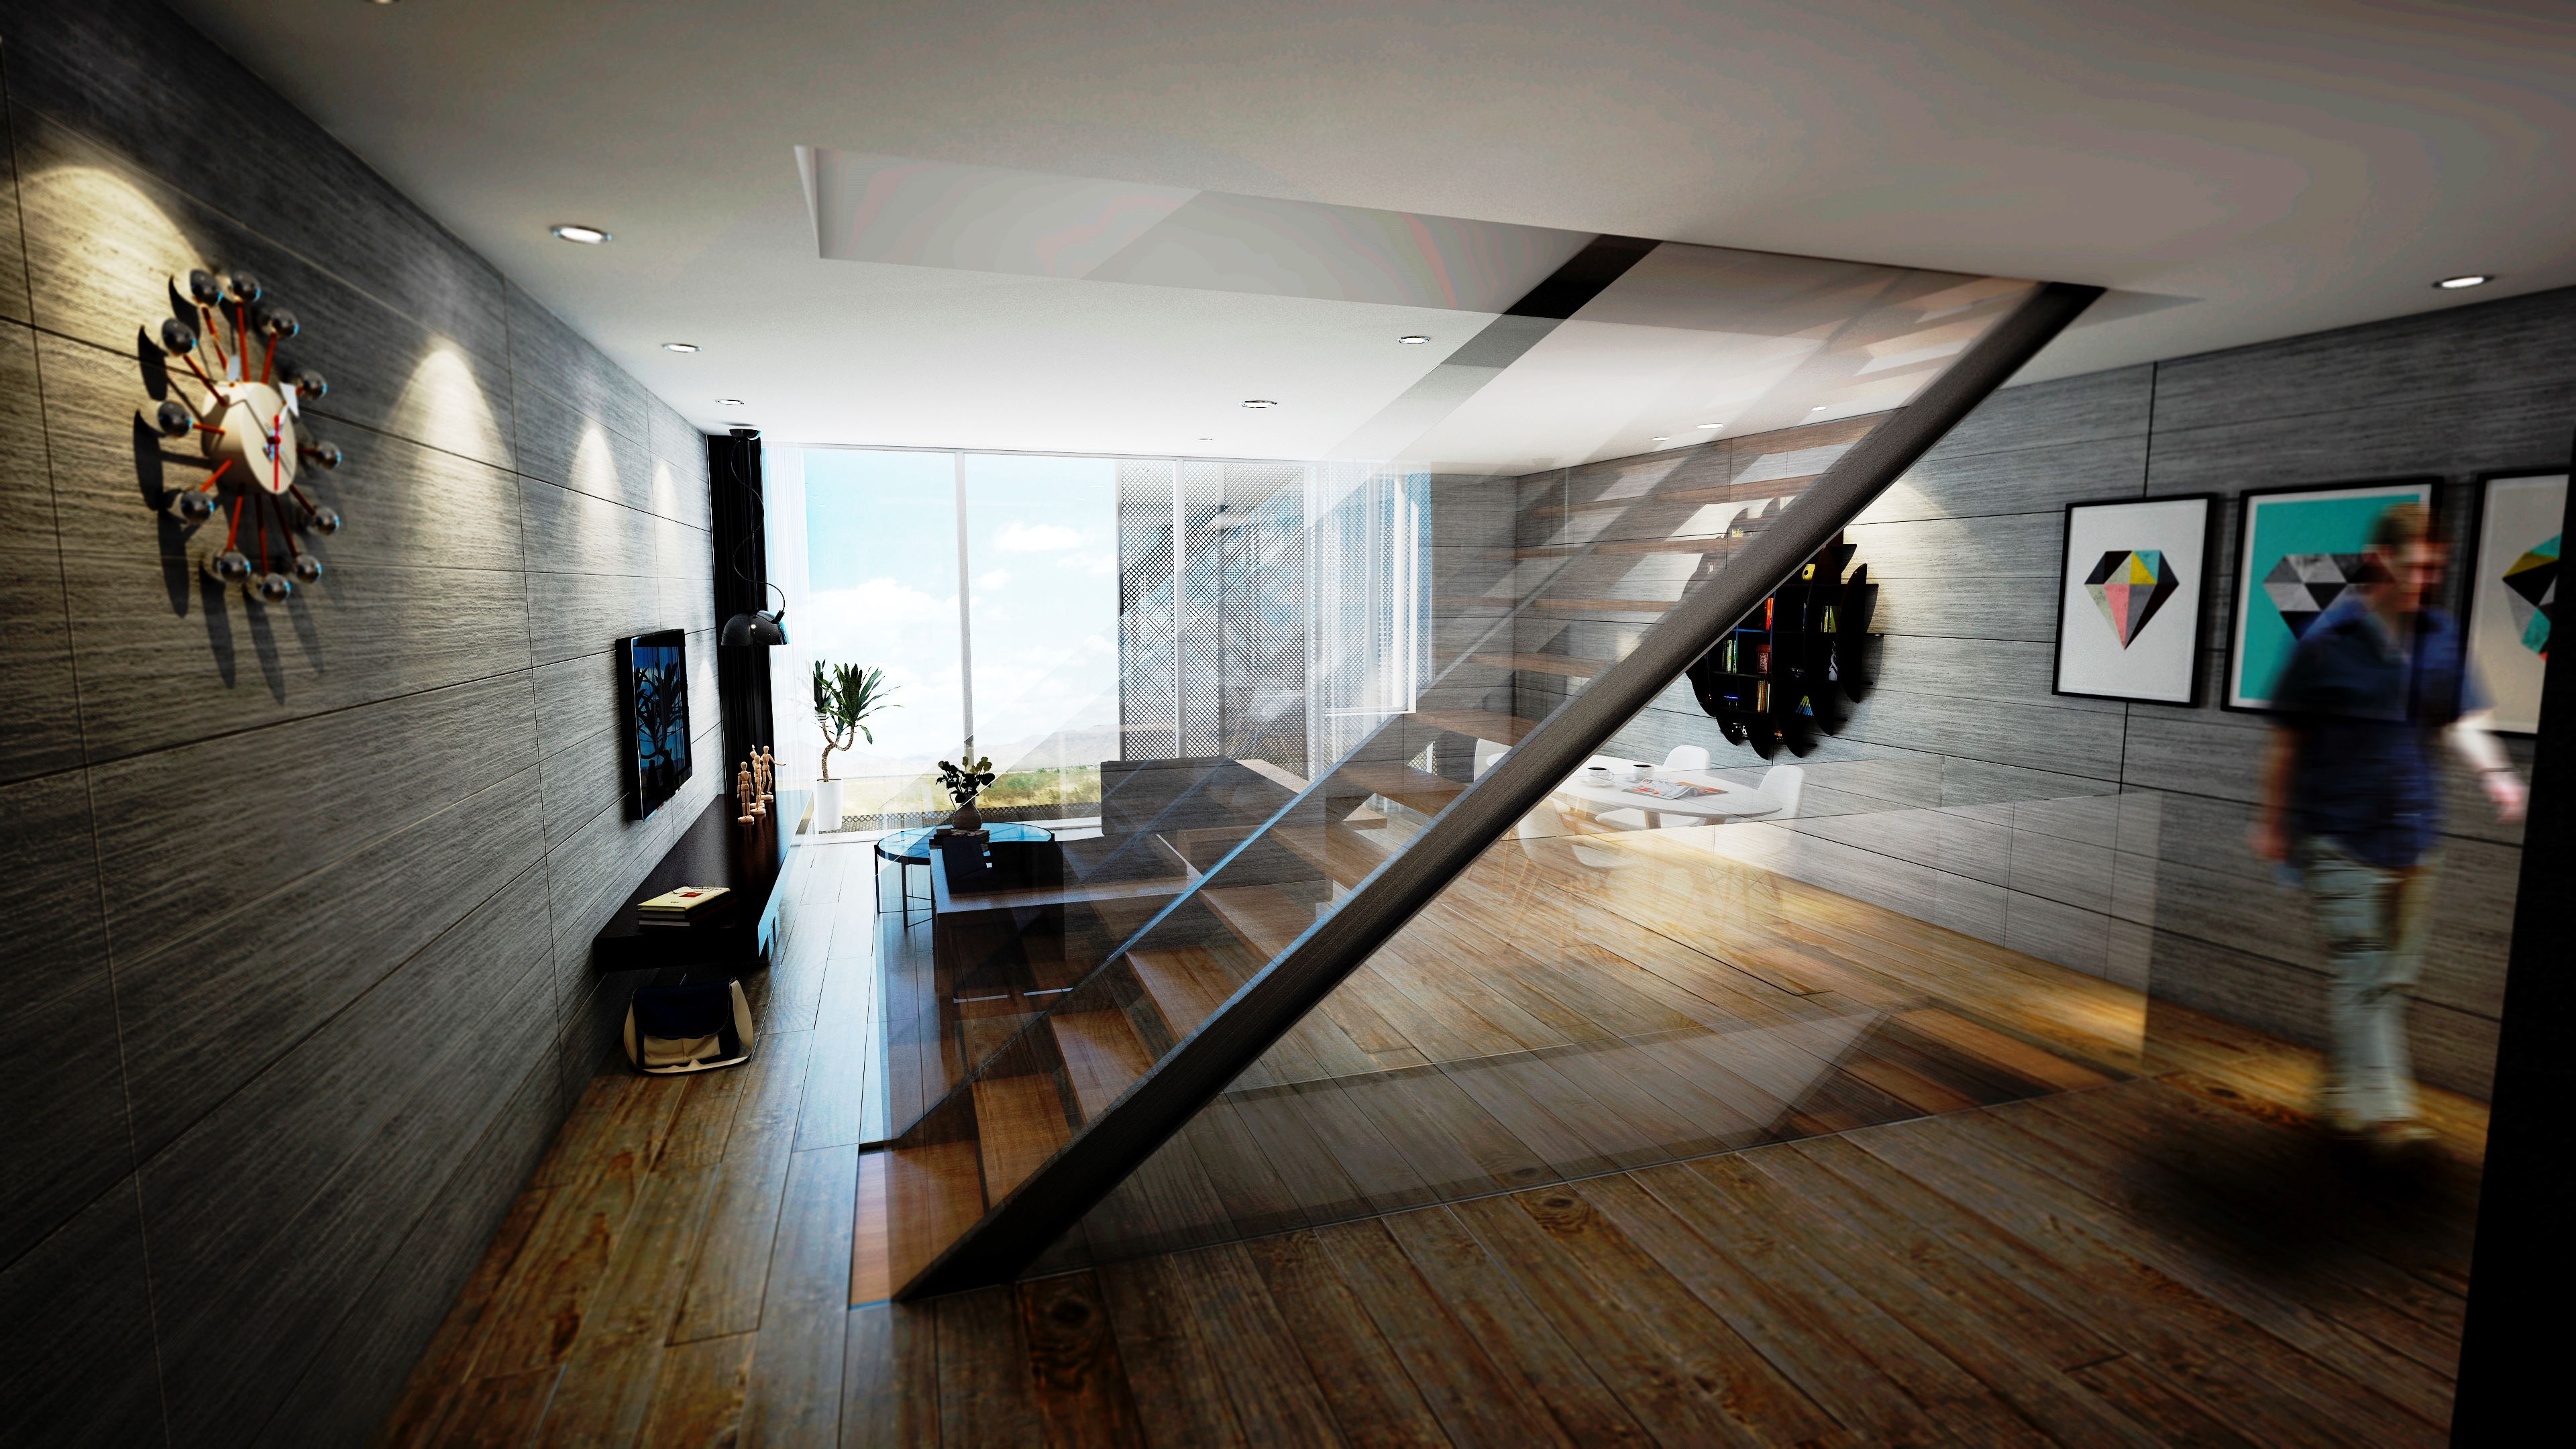 sietequince proyecto viviendas arquitectura passivhaus salón